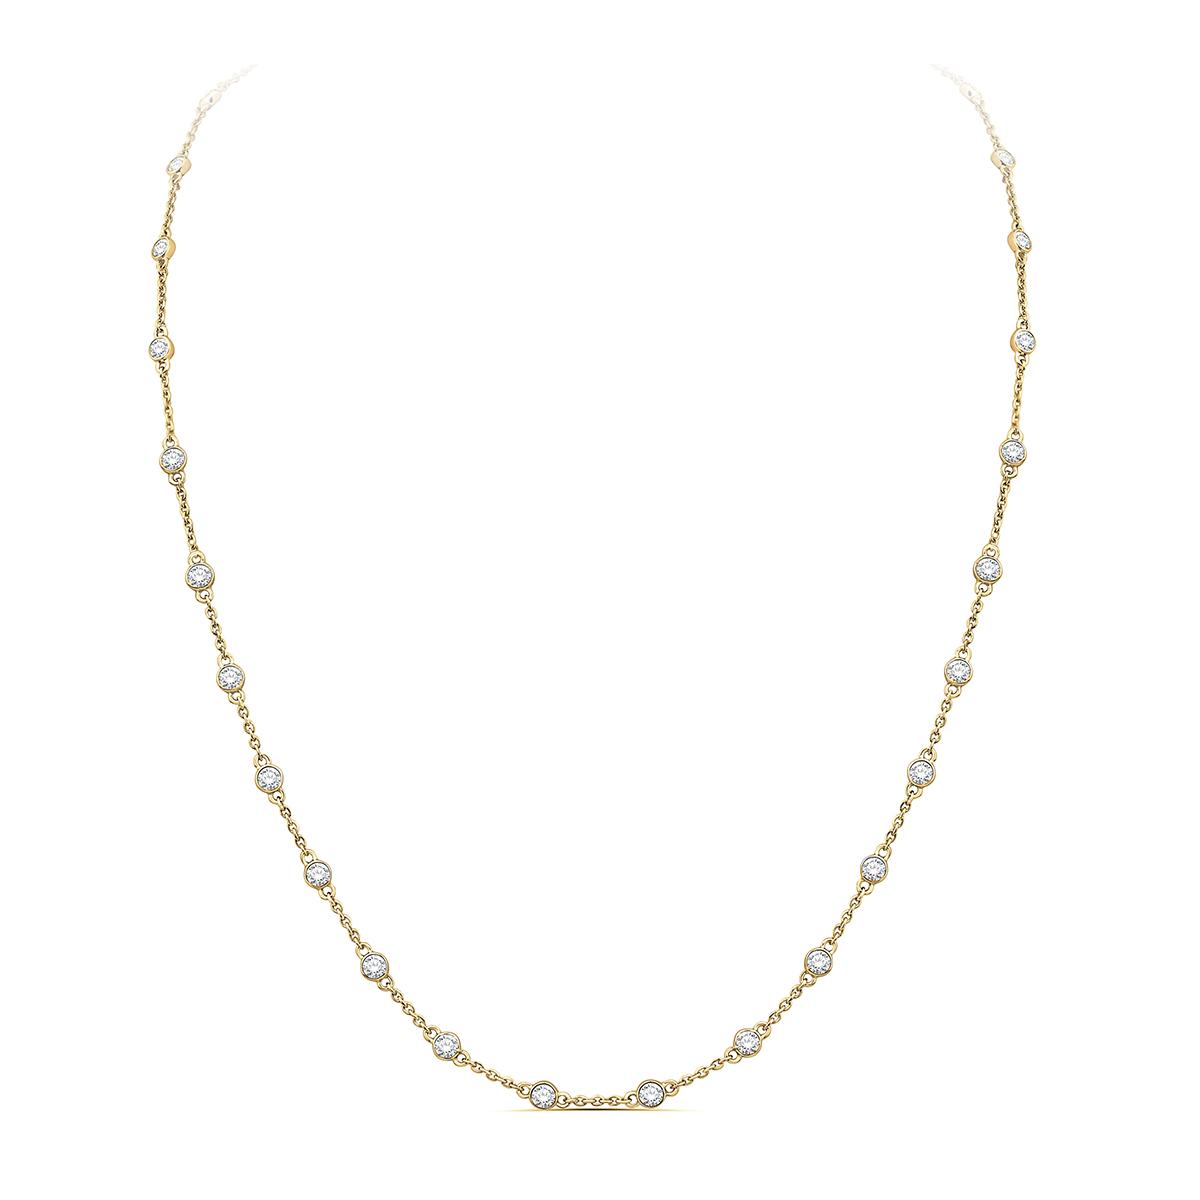 Paramount Gems 14 Karat Yellow Gold 1 Carat Diamond By the Yard Necklace